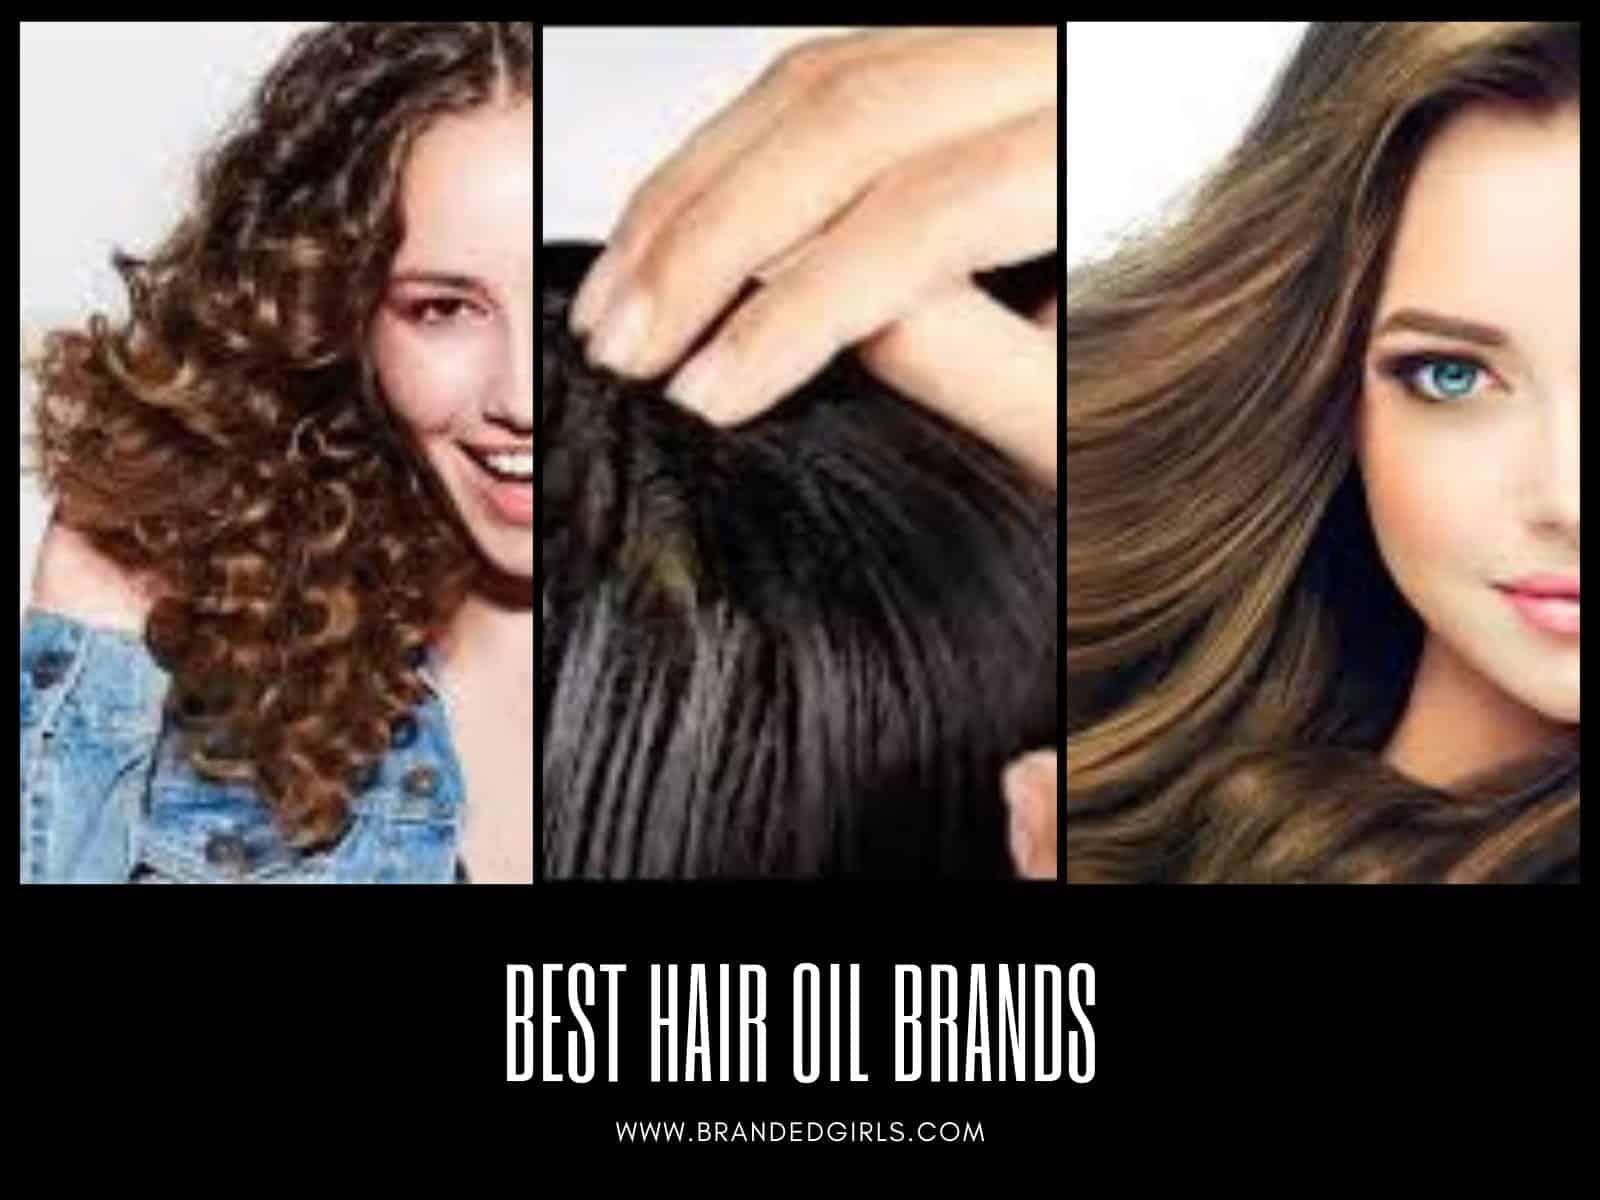 Hair-Oil-Brands Best Hair Oil Brands-15 Top Oil Brands for Hair Growth